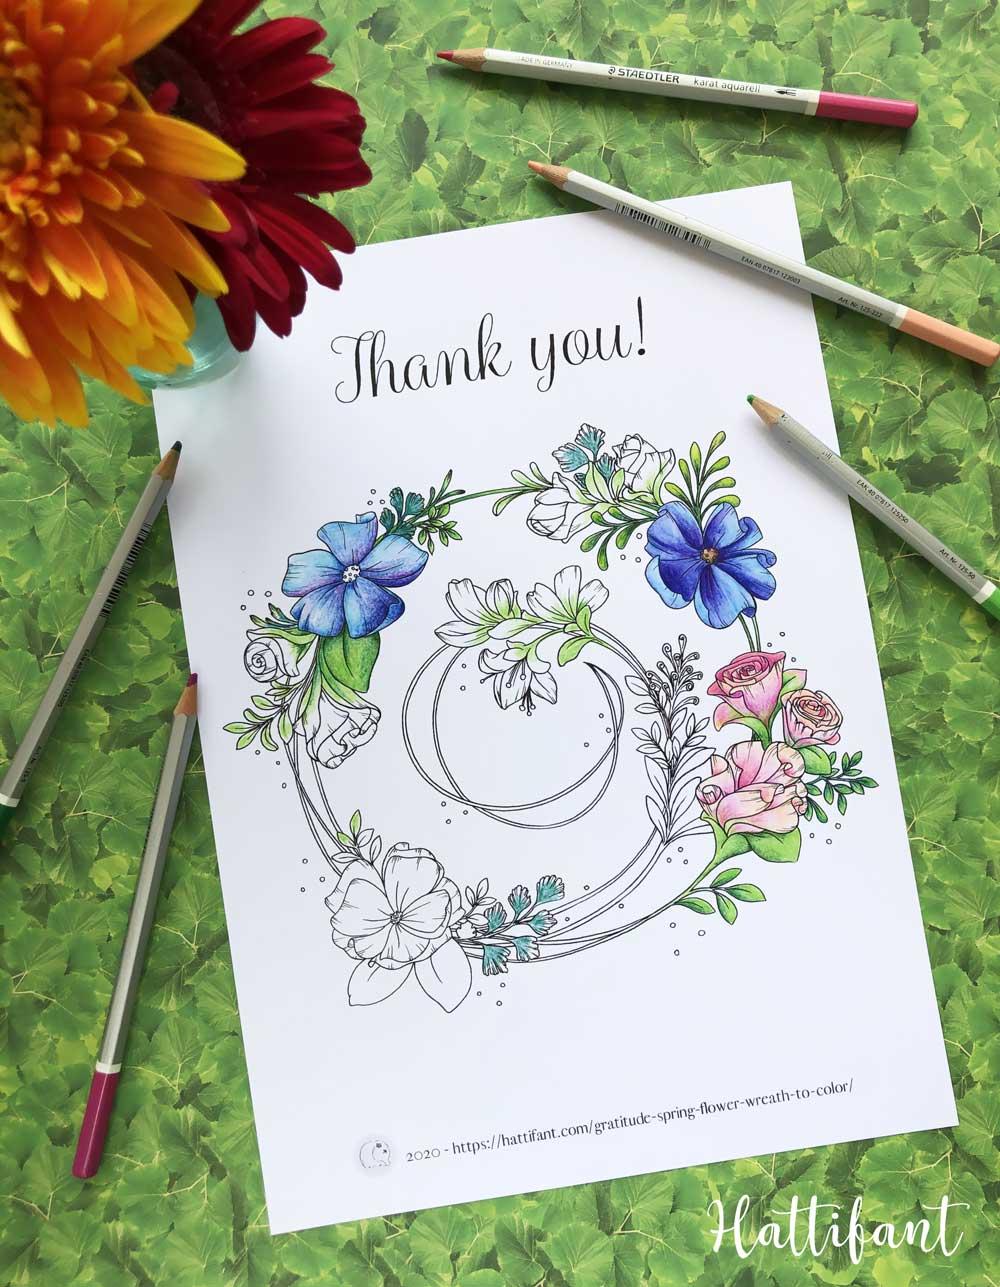 Gratitude Spring Flower Wreath Coloring Page Hattifant